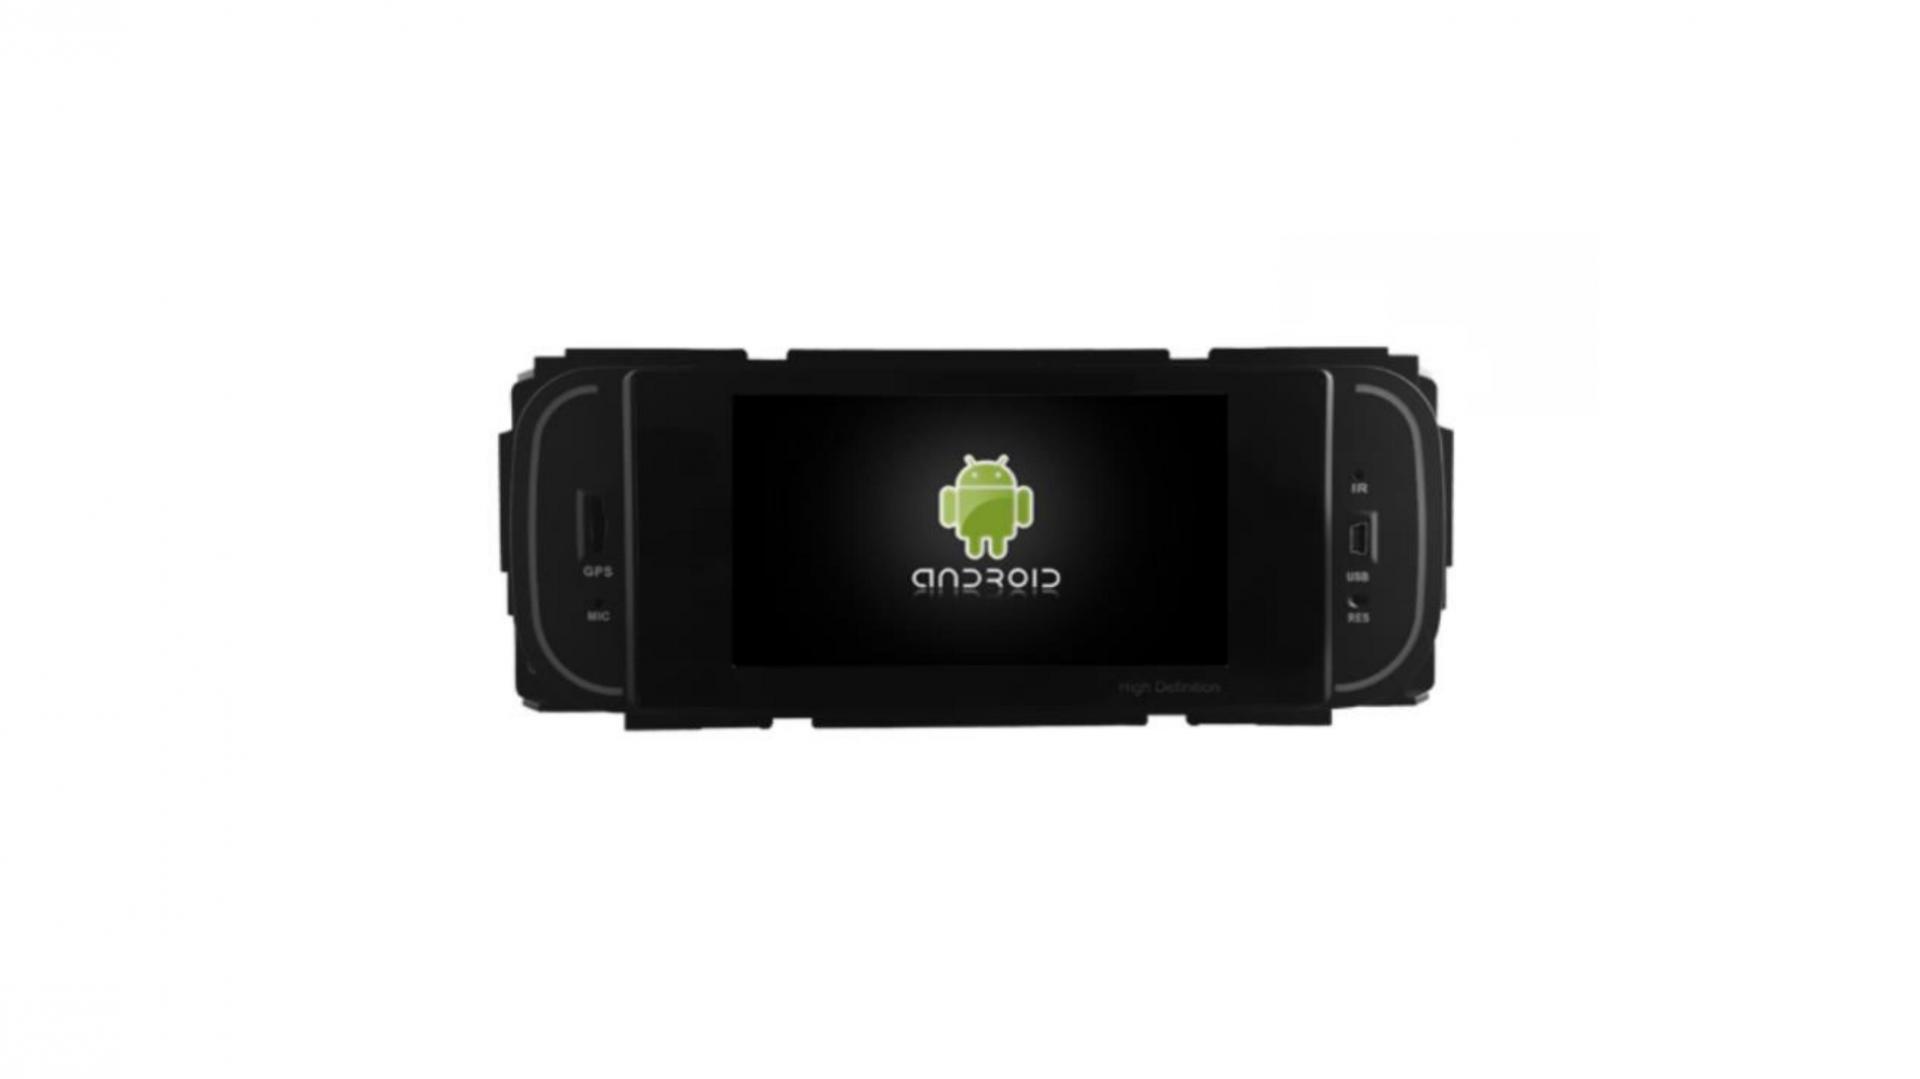 Chrysler voyager cruiser 300 sebring autoradio gps bluetooth android auto carplay camera de recul commande au volant 1